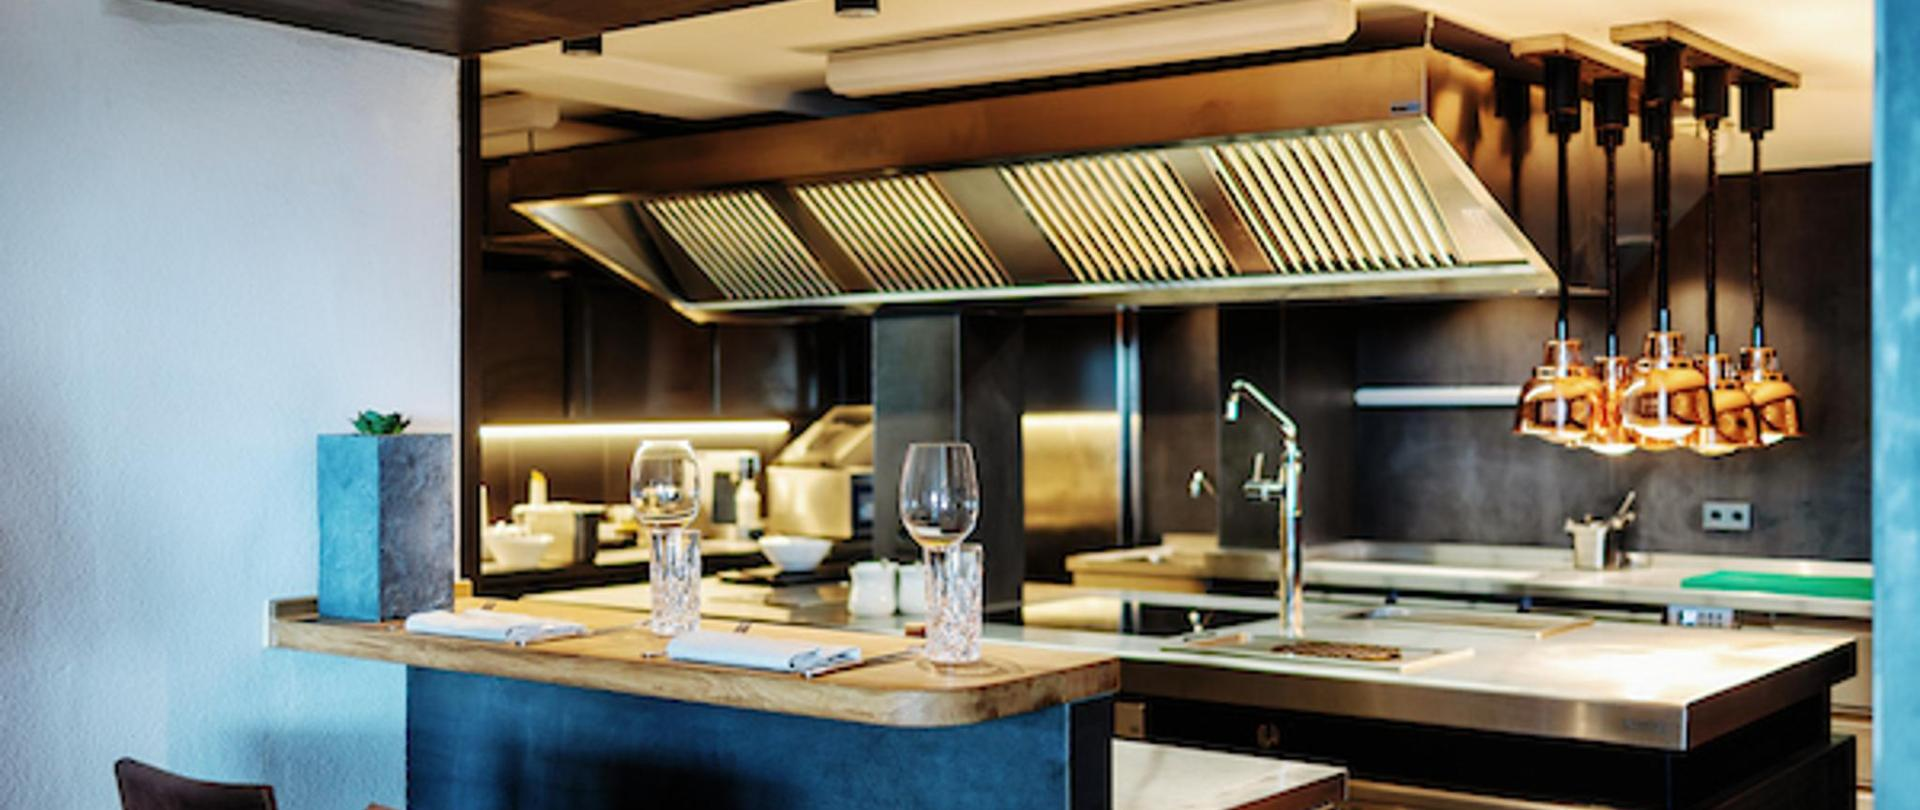 Küche small.jpg